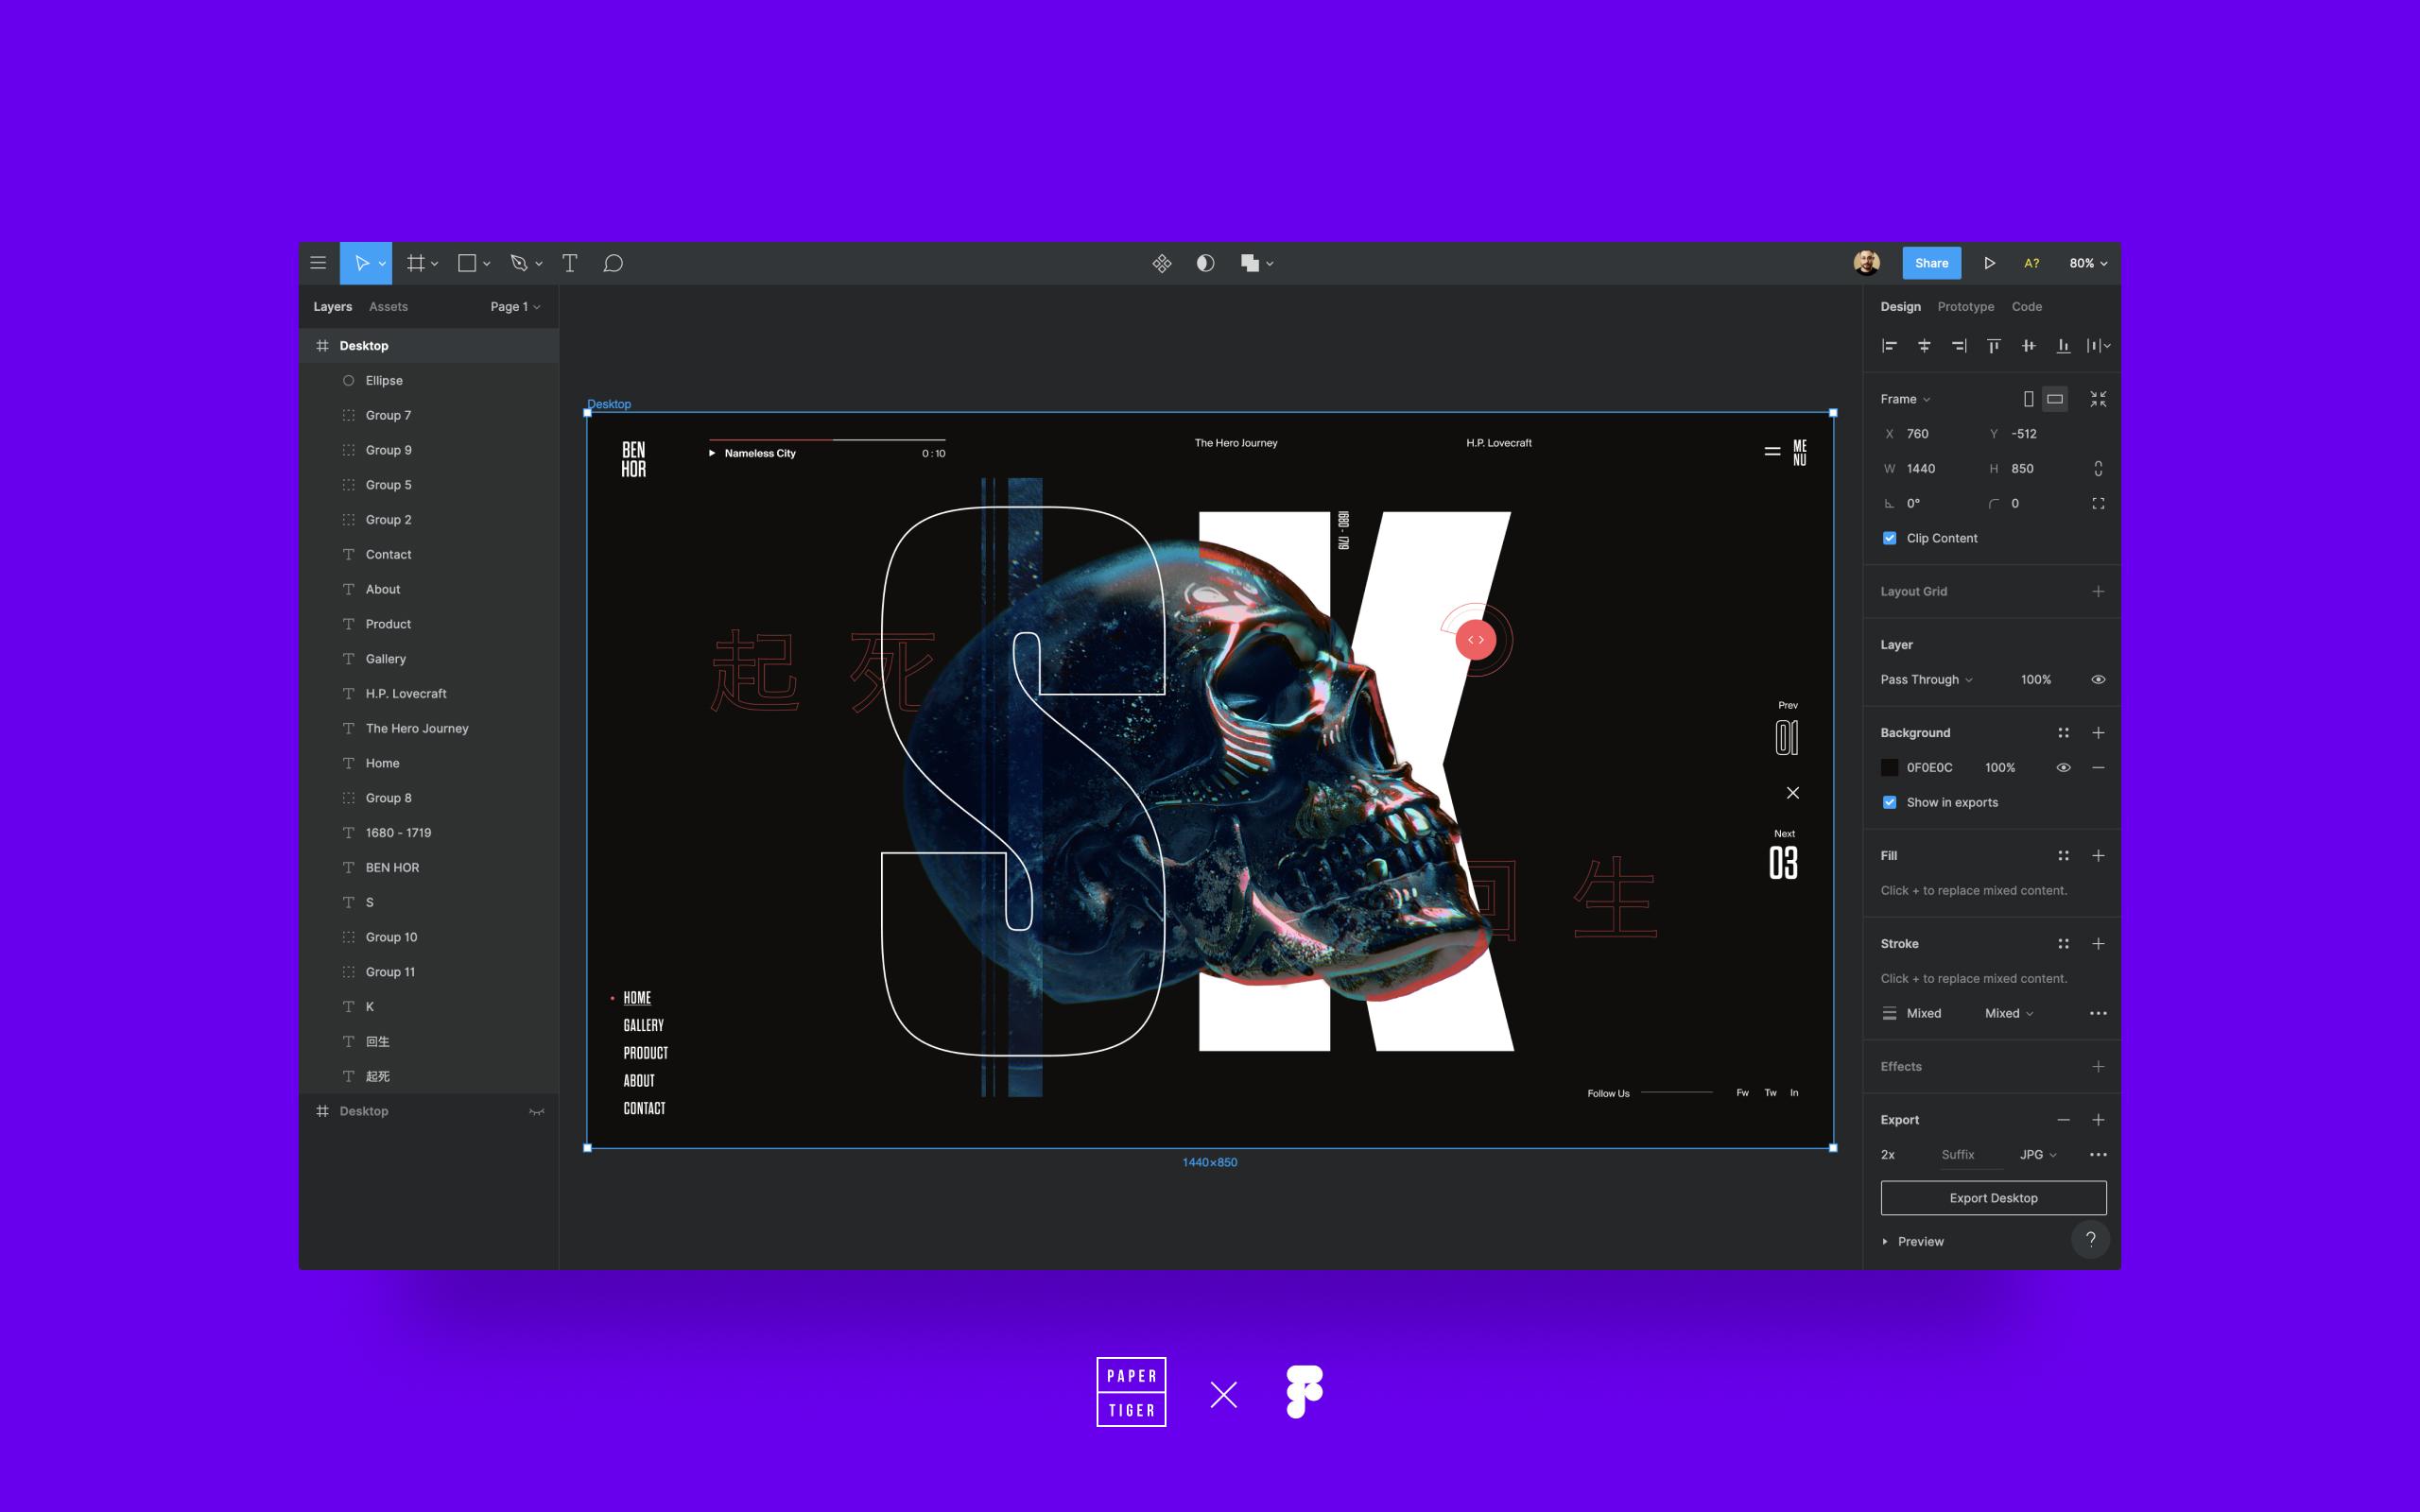 GitHub - PaperTiger/figma-dark-ui: Dark UI Mode Plugin for Figma App